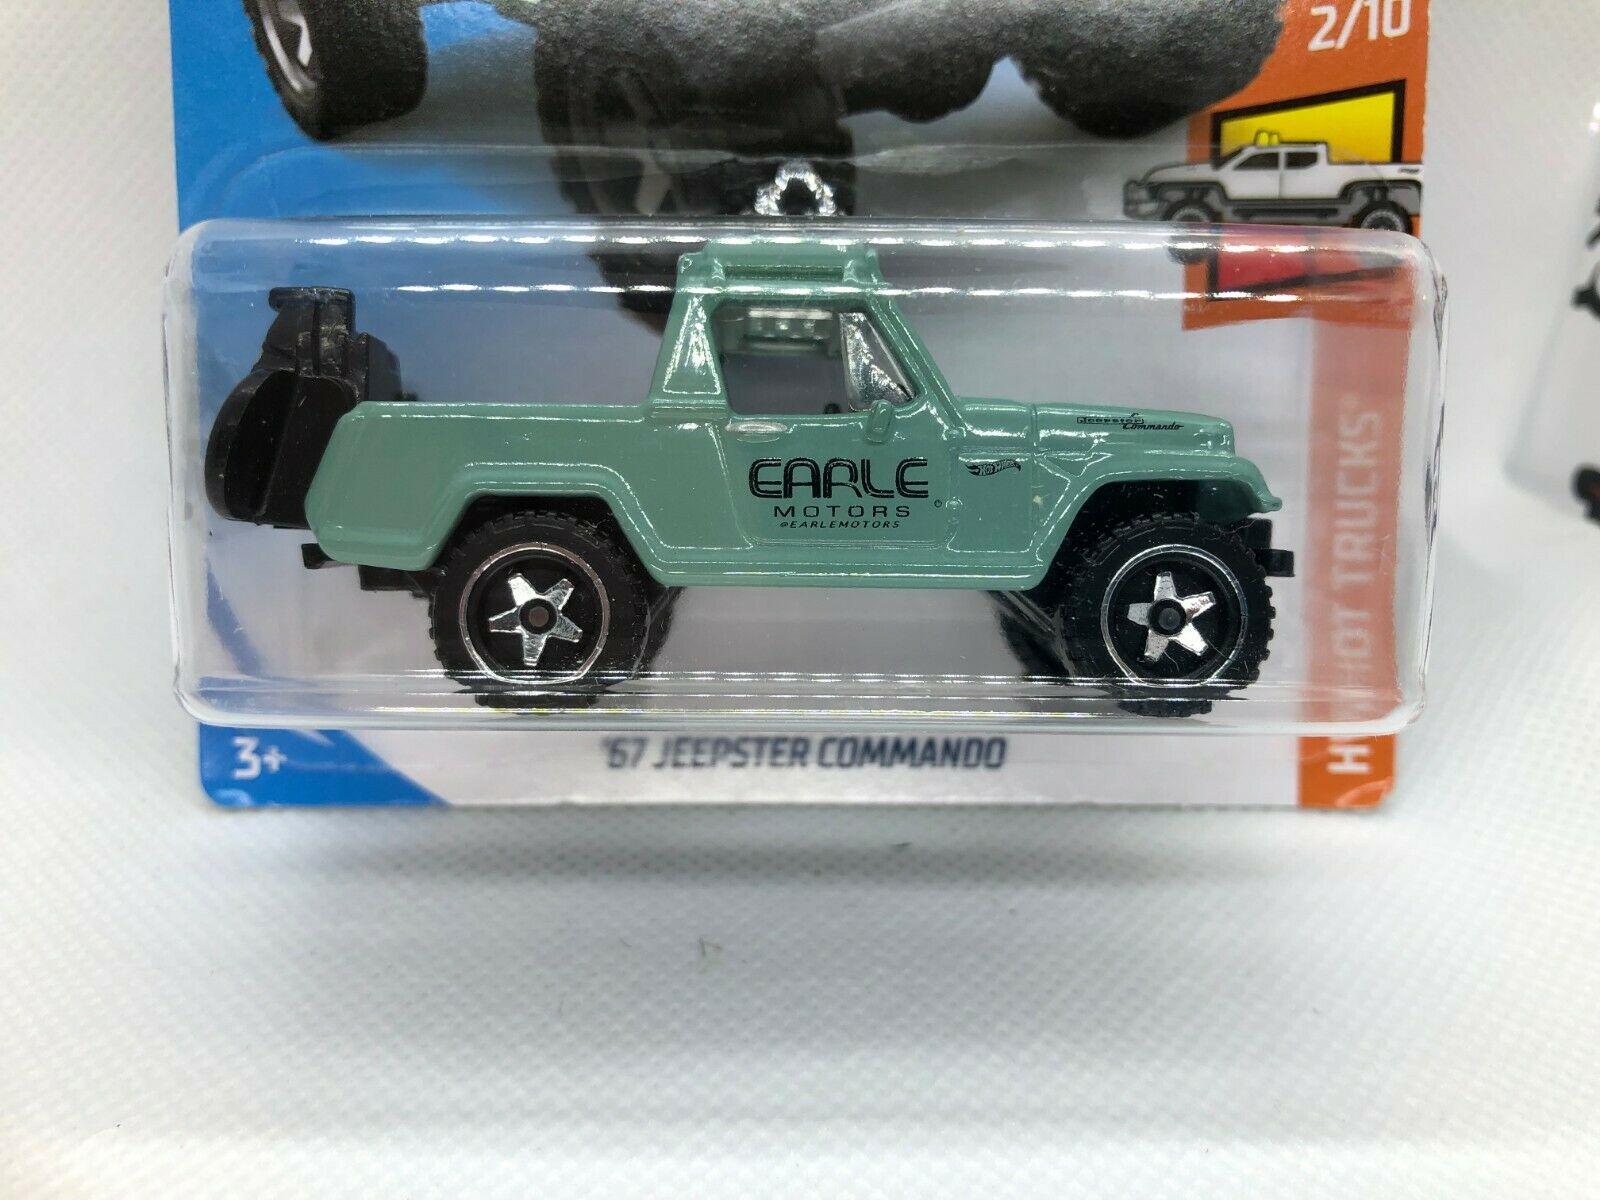 67 Jeepster Commando